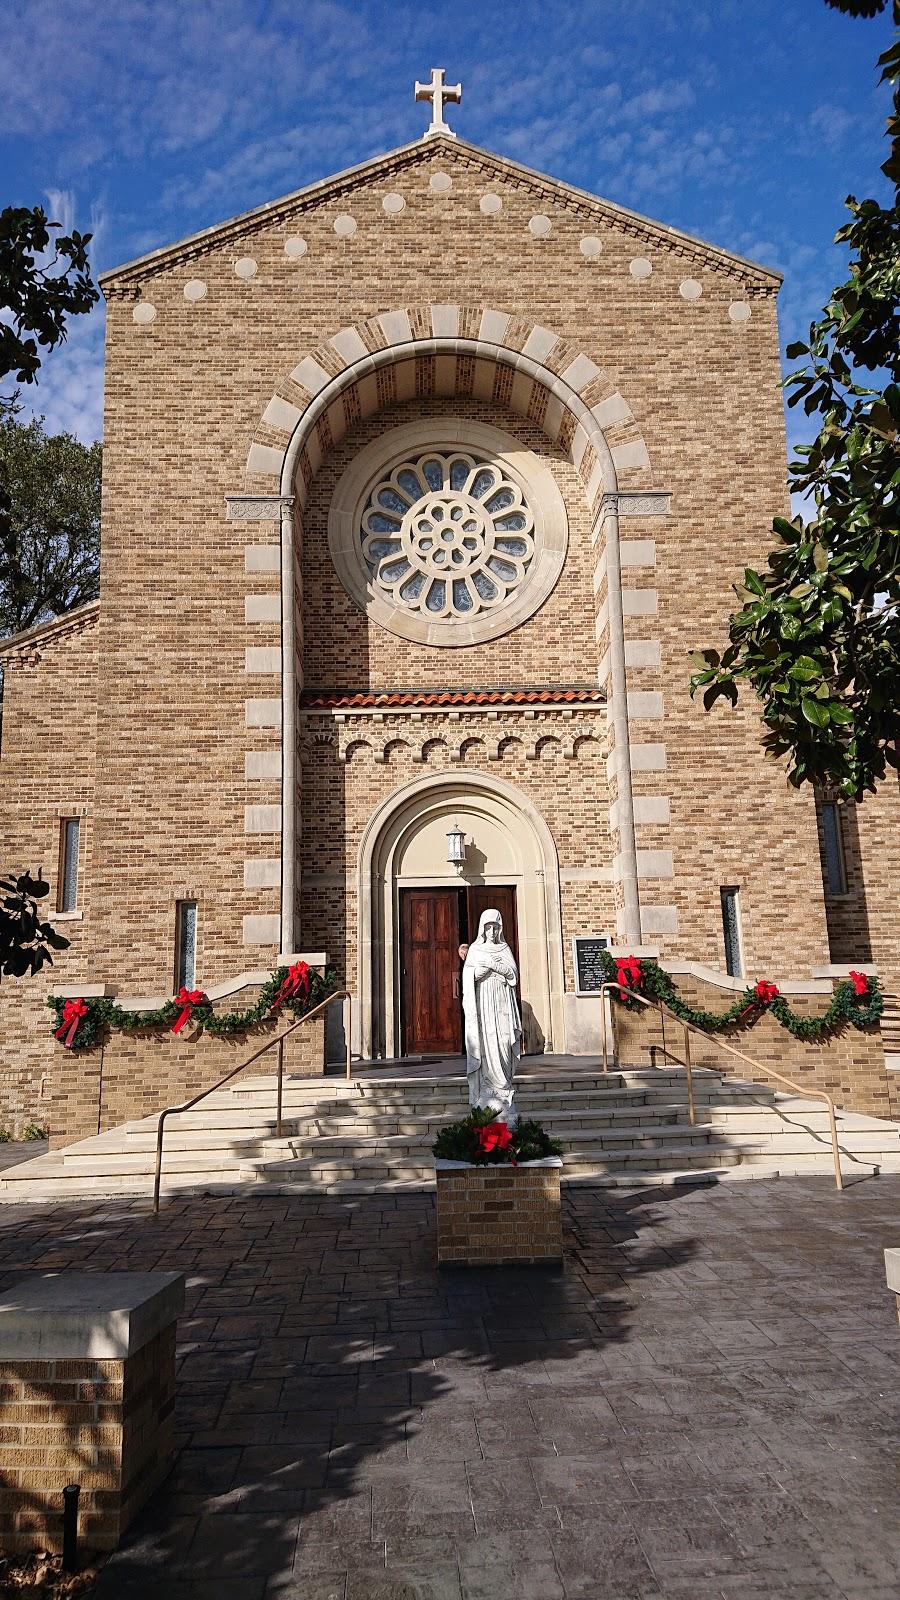 St Marys Church - church    Photo 7 of 10   Address: 816 Park Dr, La Porte, TX 77571, USA   Phone: (281) 471-2000